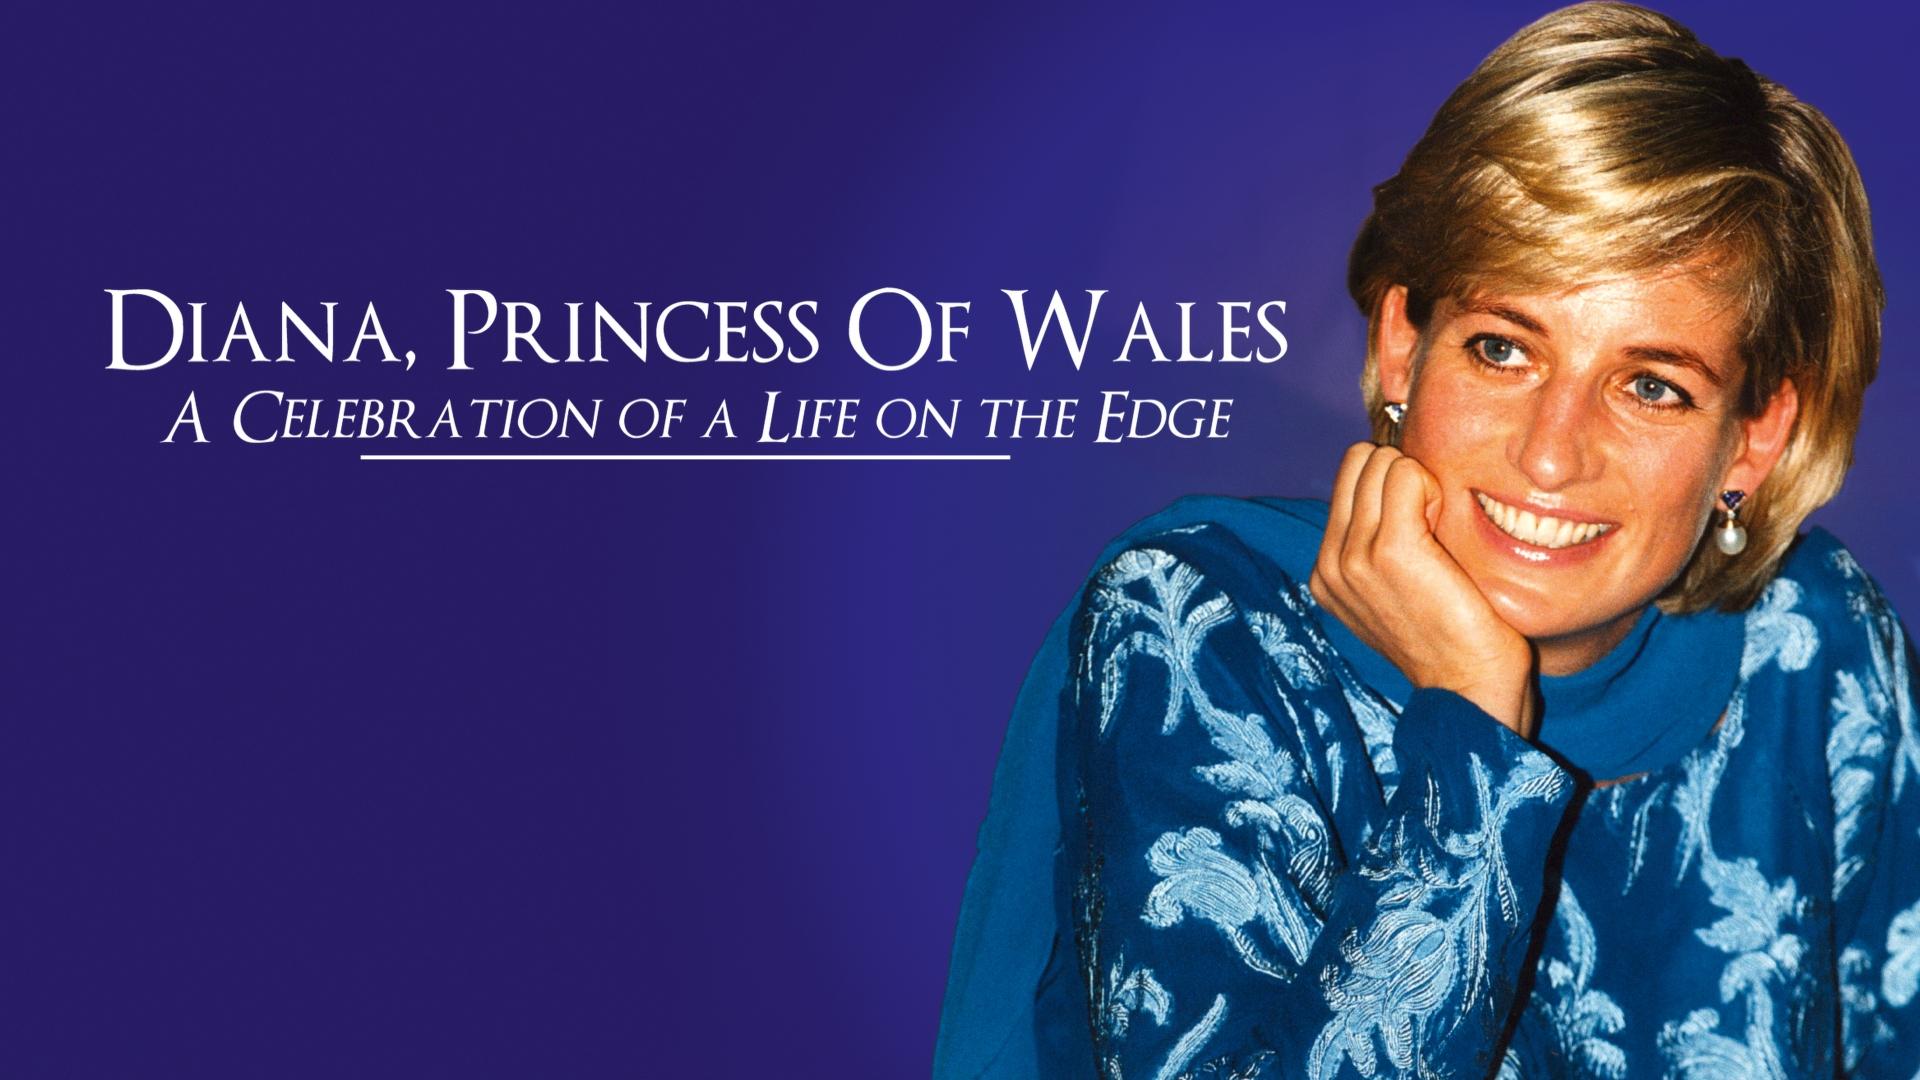 Diana Princess of Wales - A Celebration of a life on the edge